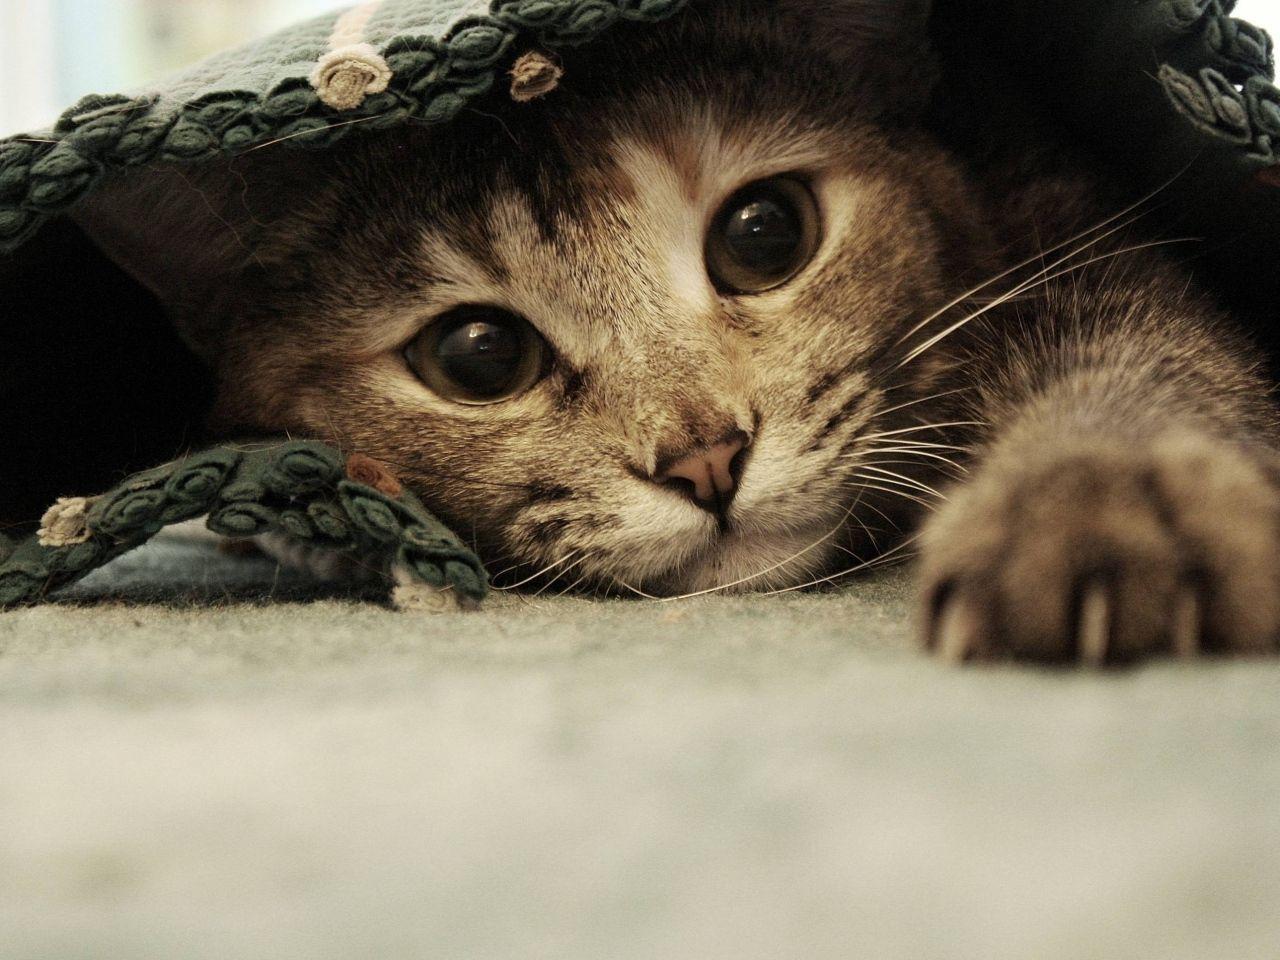 Kissanpentu Kuvia Kissa Taustakuvia Silmat Vektori Tassut Taustat Tumma Materiaali Tyopoydan Taustak Cute Cat Wallpaper Funny Cat Wallpaper Cat Photography